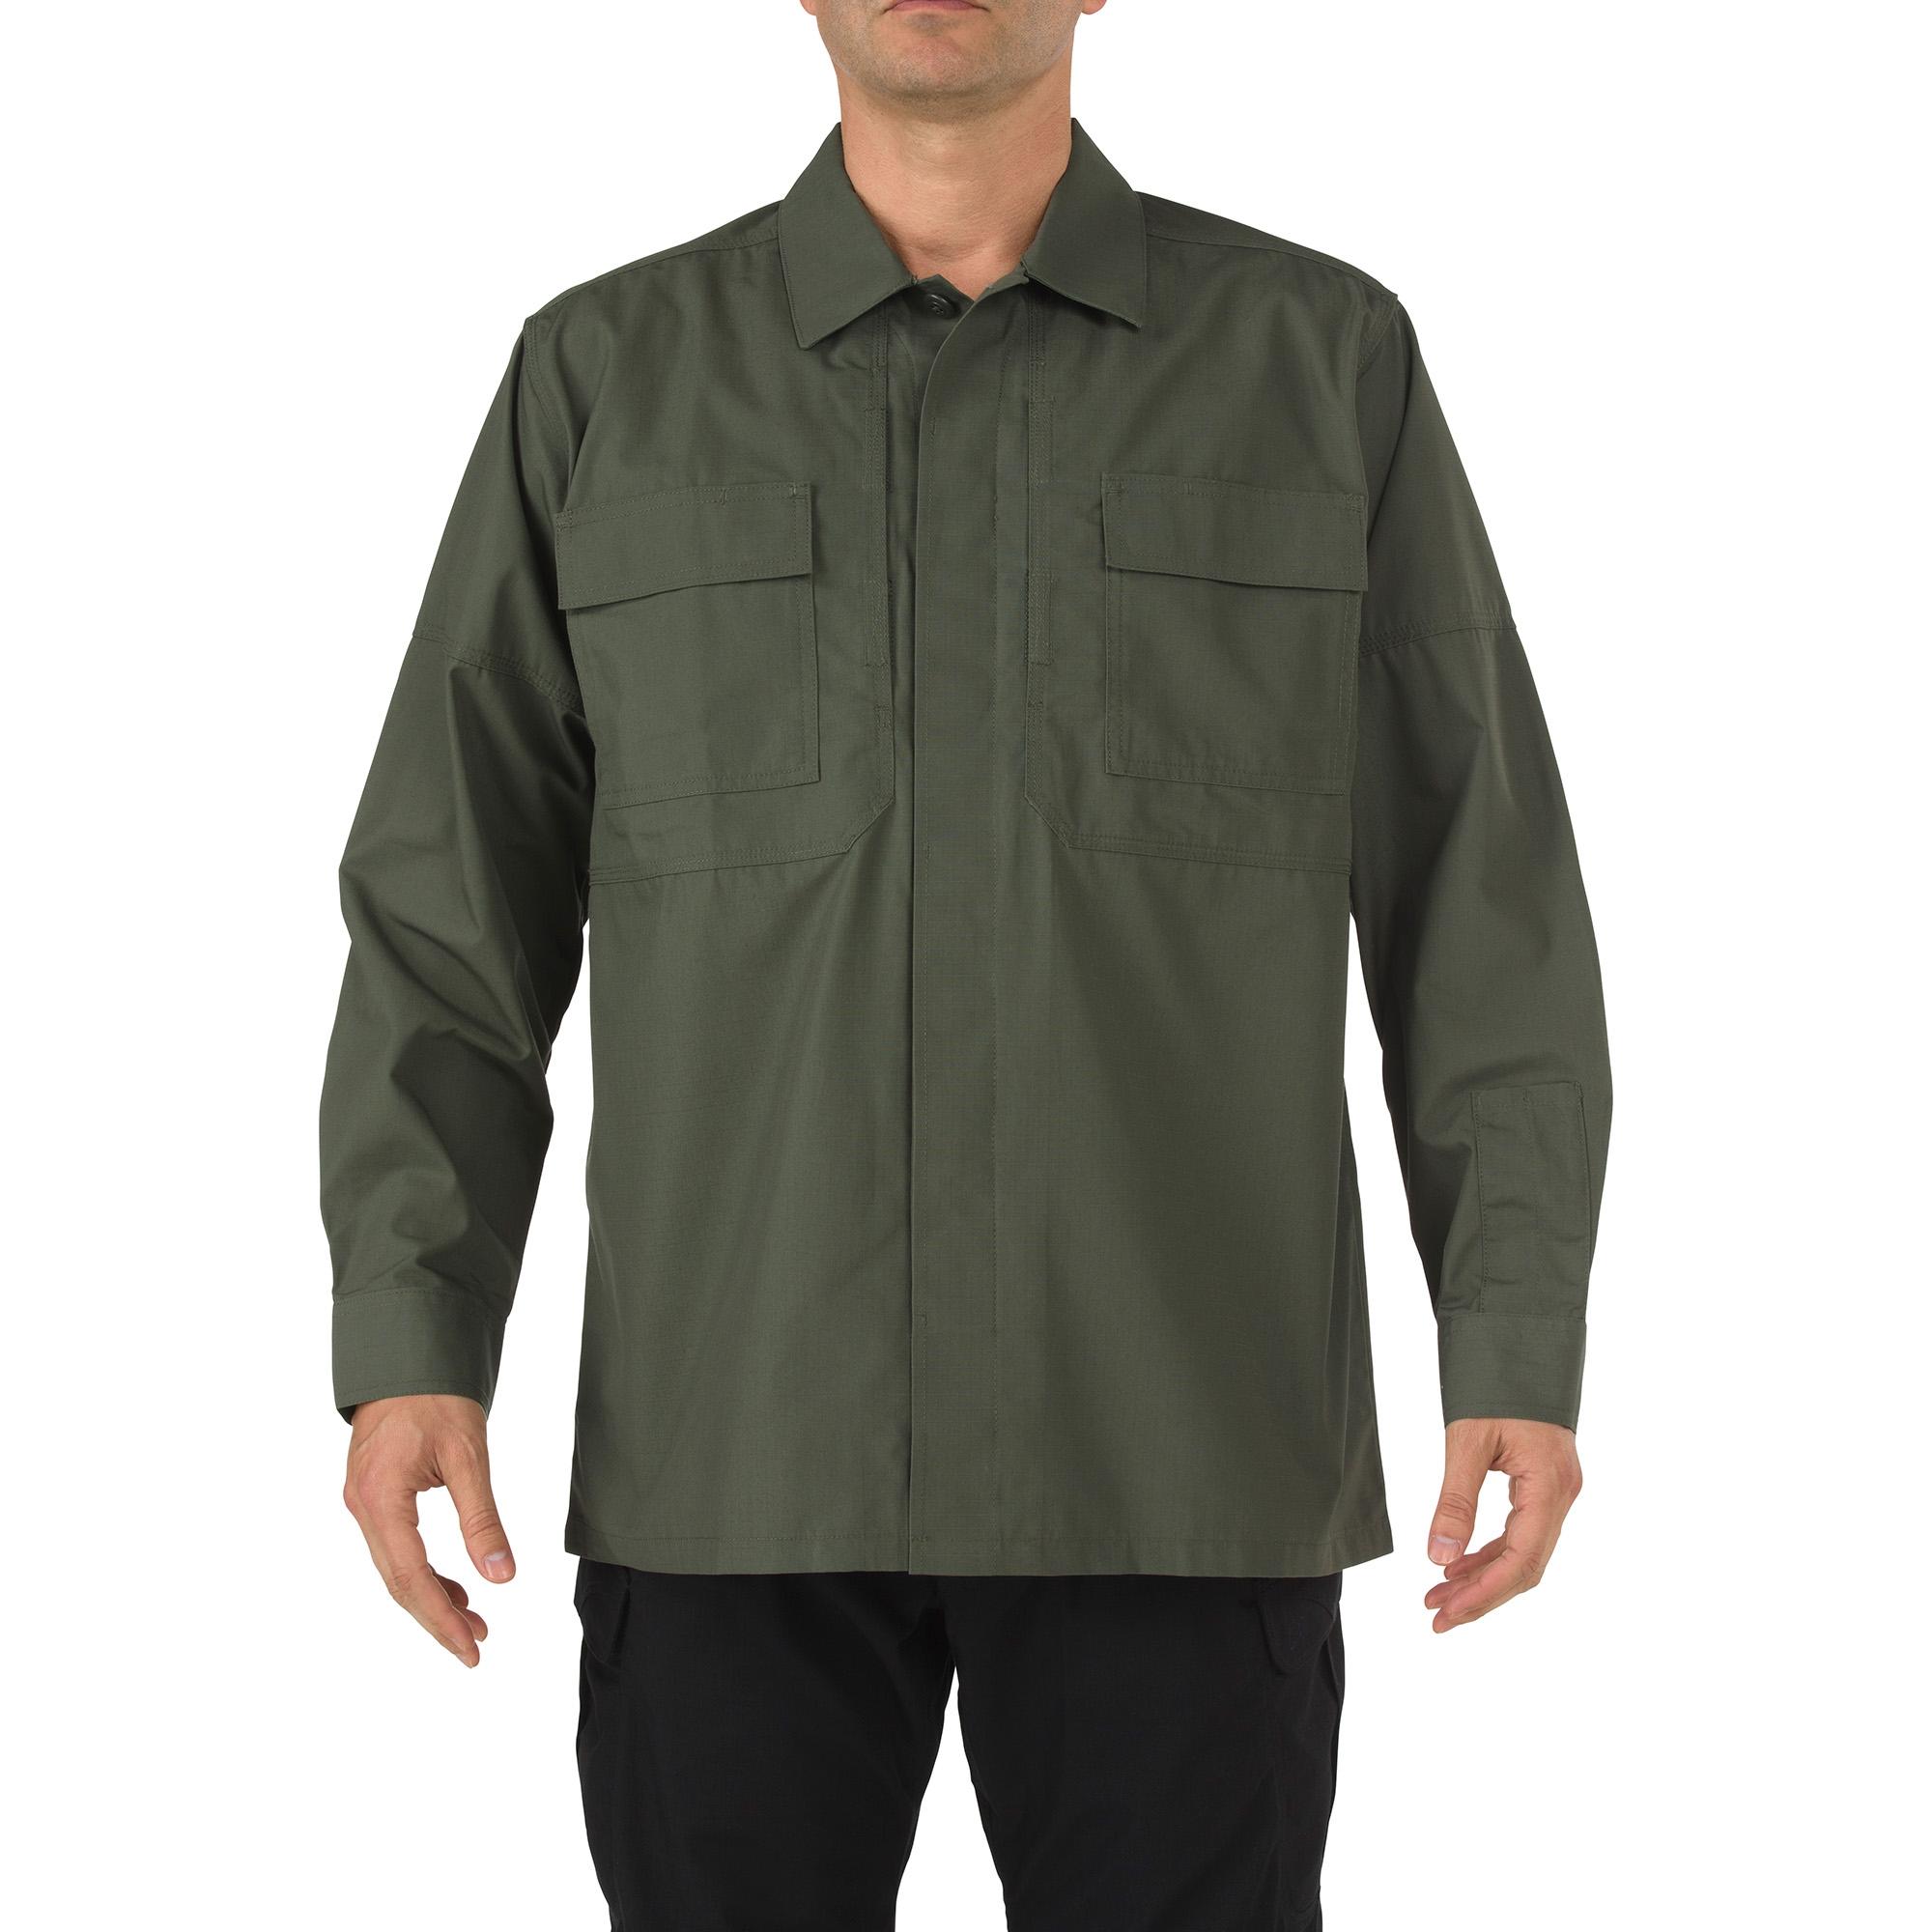 TDU Shirt - Long Sleeve, Ripstop